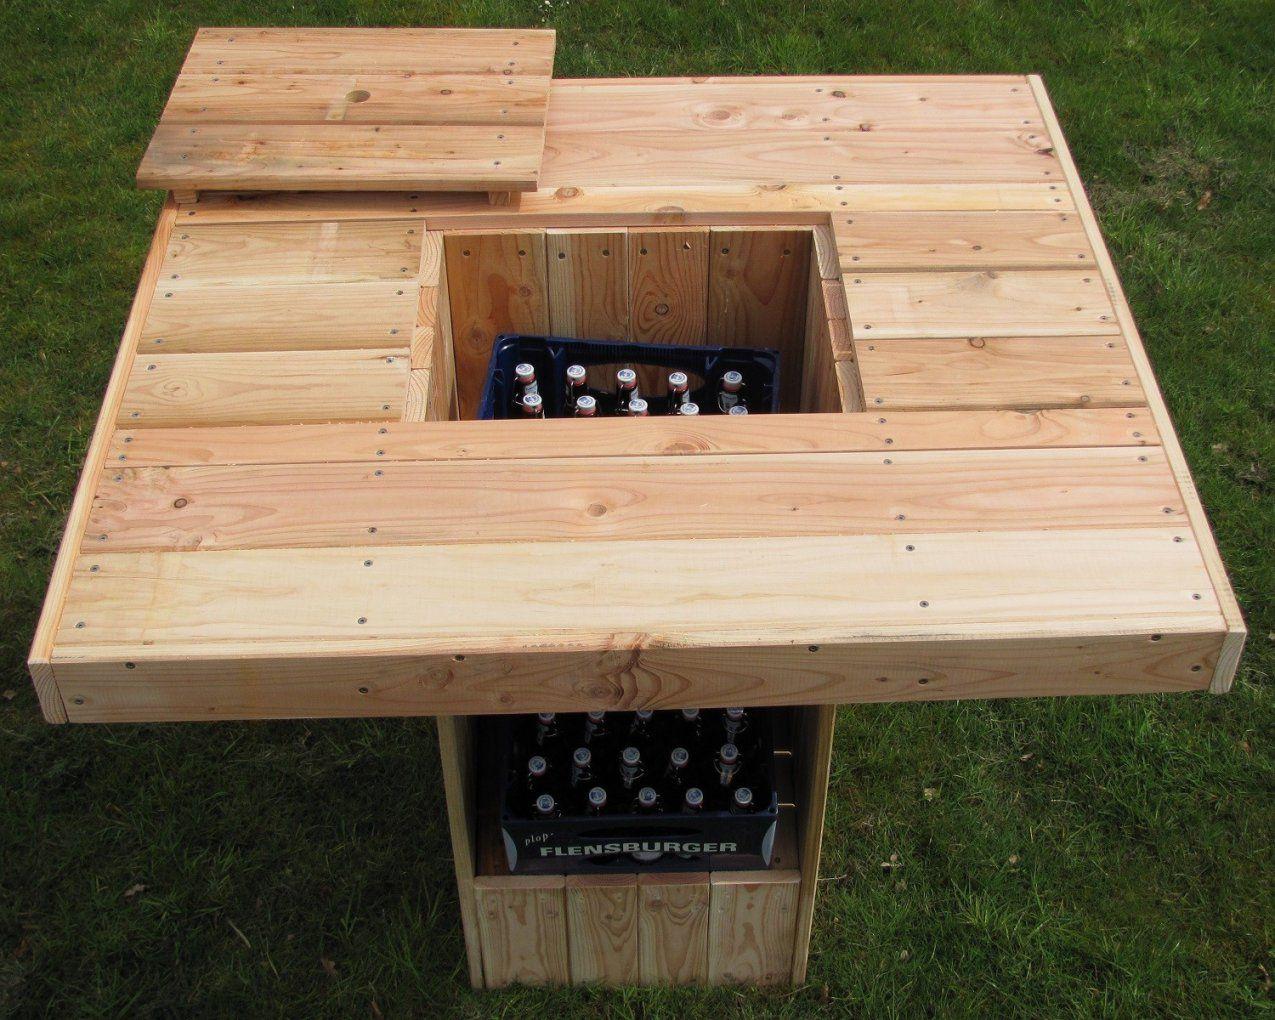 Modern Gartentisch Holz Rustikal Selber Bauen Kartaginafo Zum Avec von Gartentisch Holz Rustikal Selber Bauen Bild